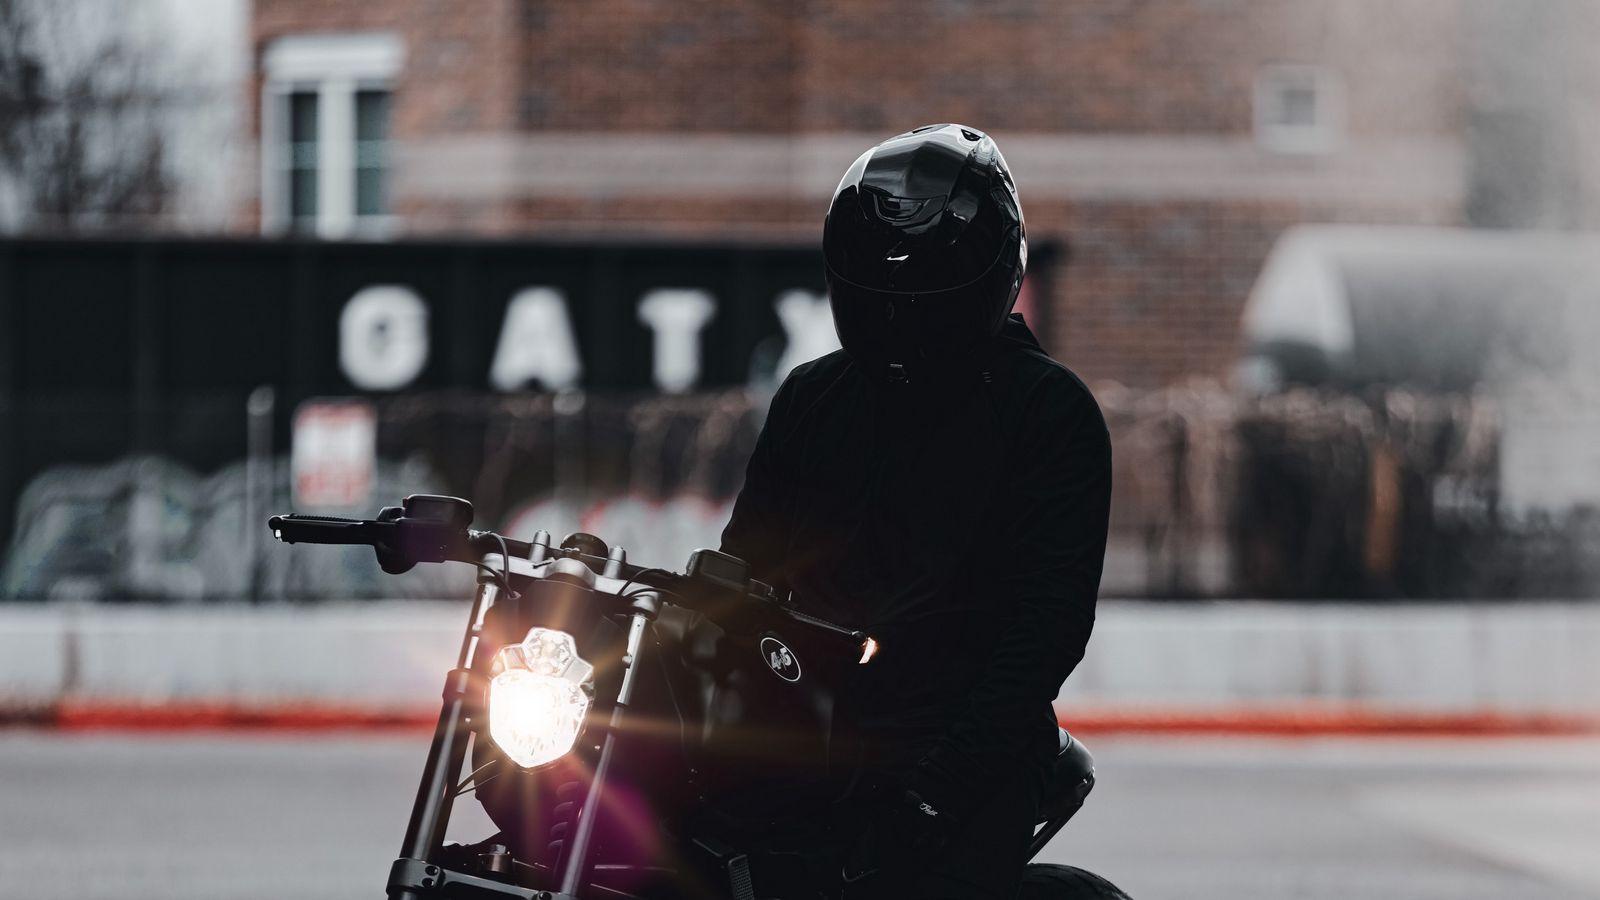 1600x900 Обои мотоцикл, байк, мотоциклист, черный, свет, дорога